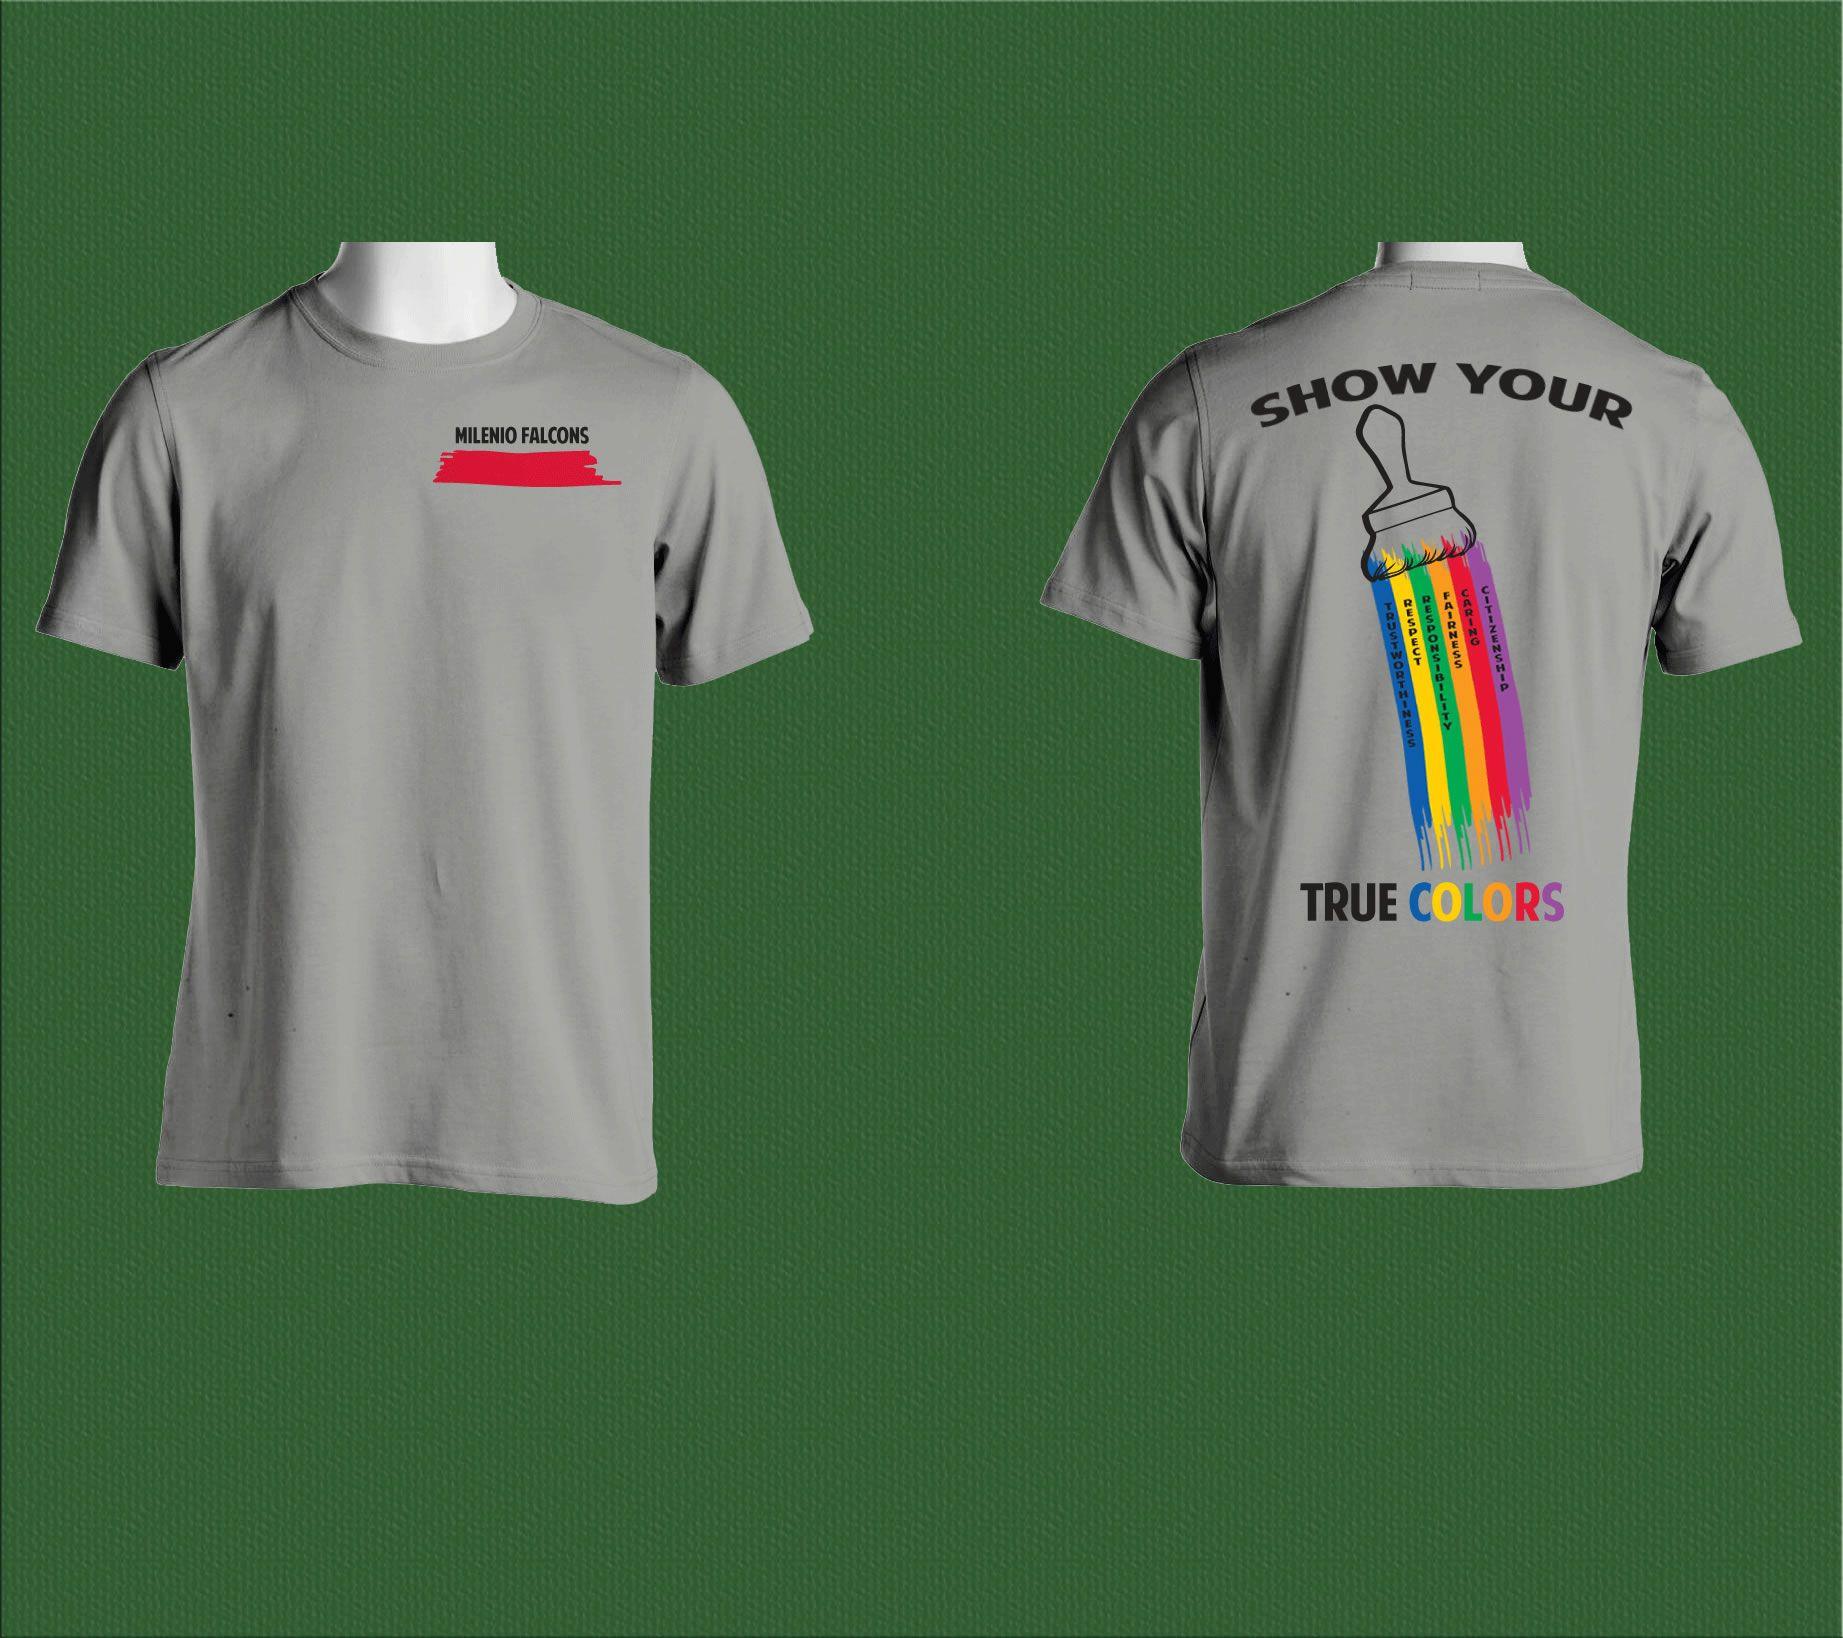 T-shirt design for Elementary School kids T-shirt design #28 by ...